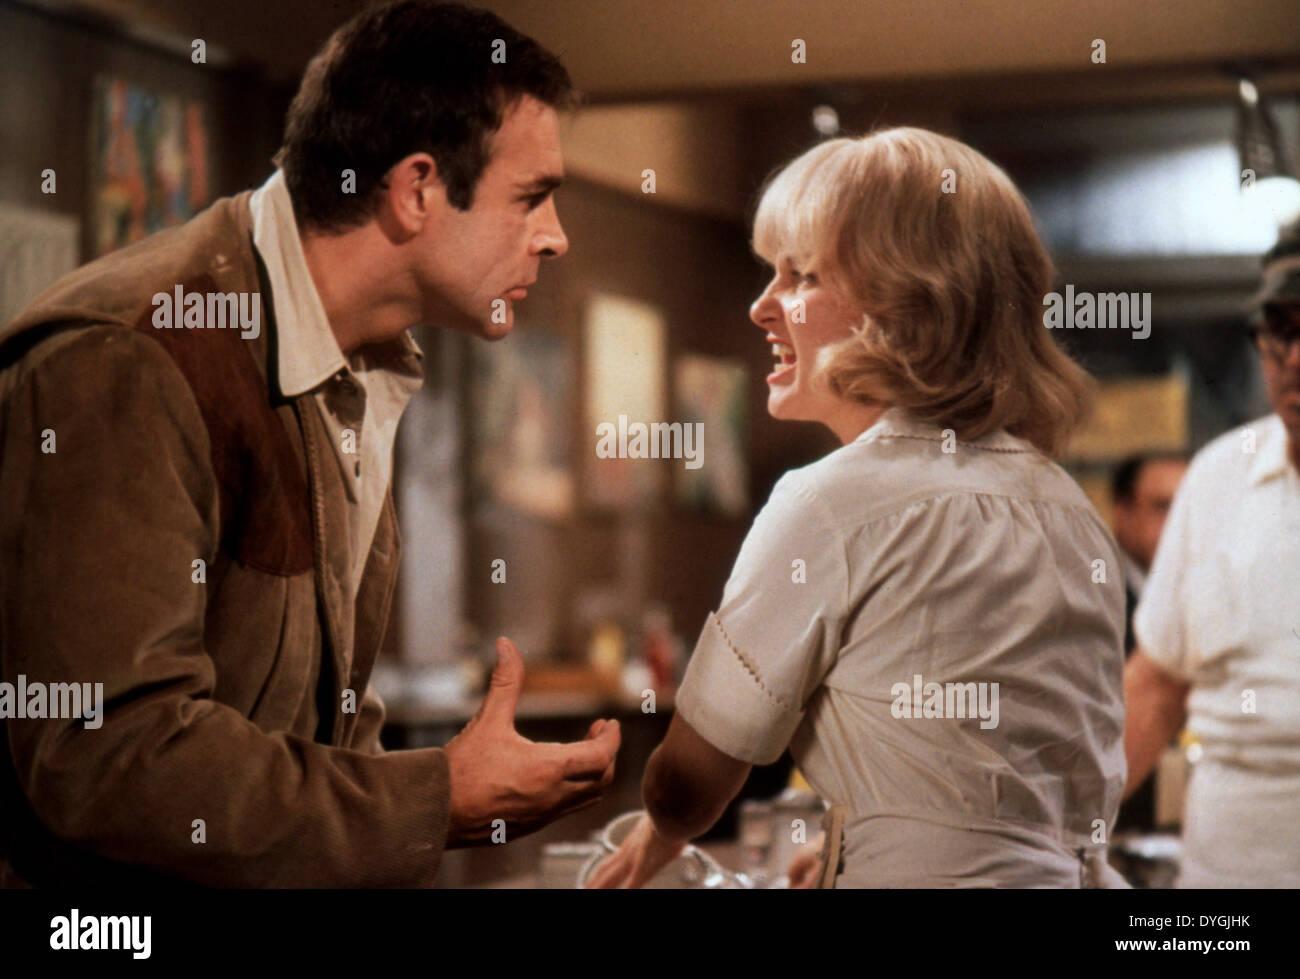 JEAN SEBERG, JOANNE WOODWARD, SEAN CONNERY, A FINE MADNESS, 1966 Stock Photo: 30929112 - Alamy